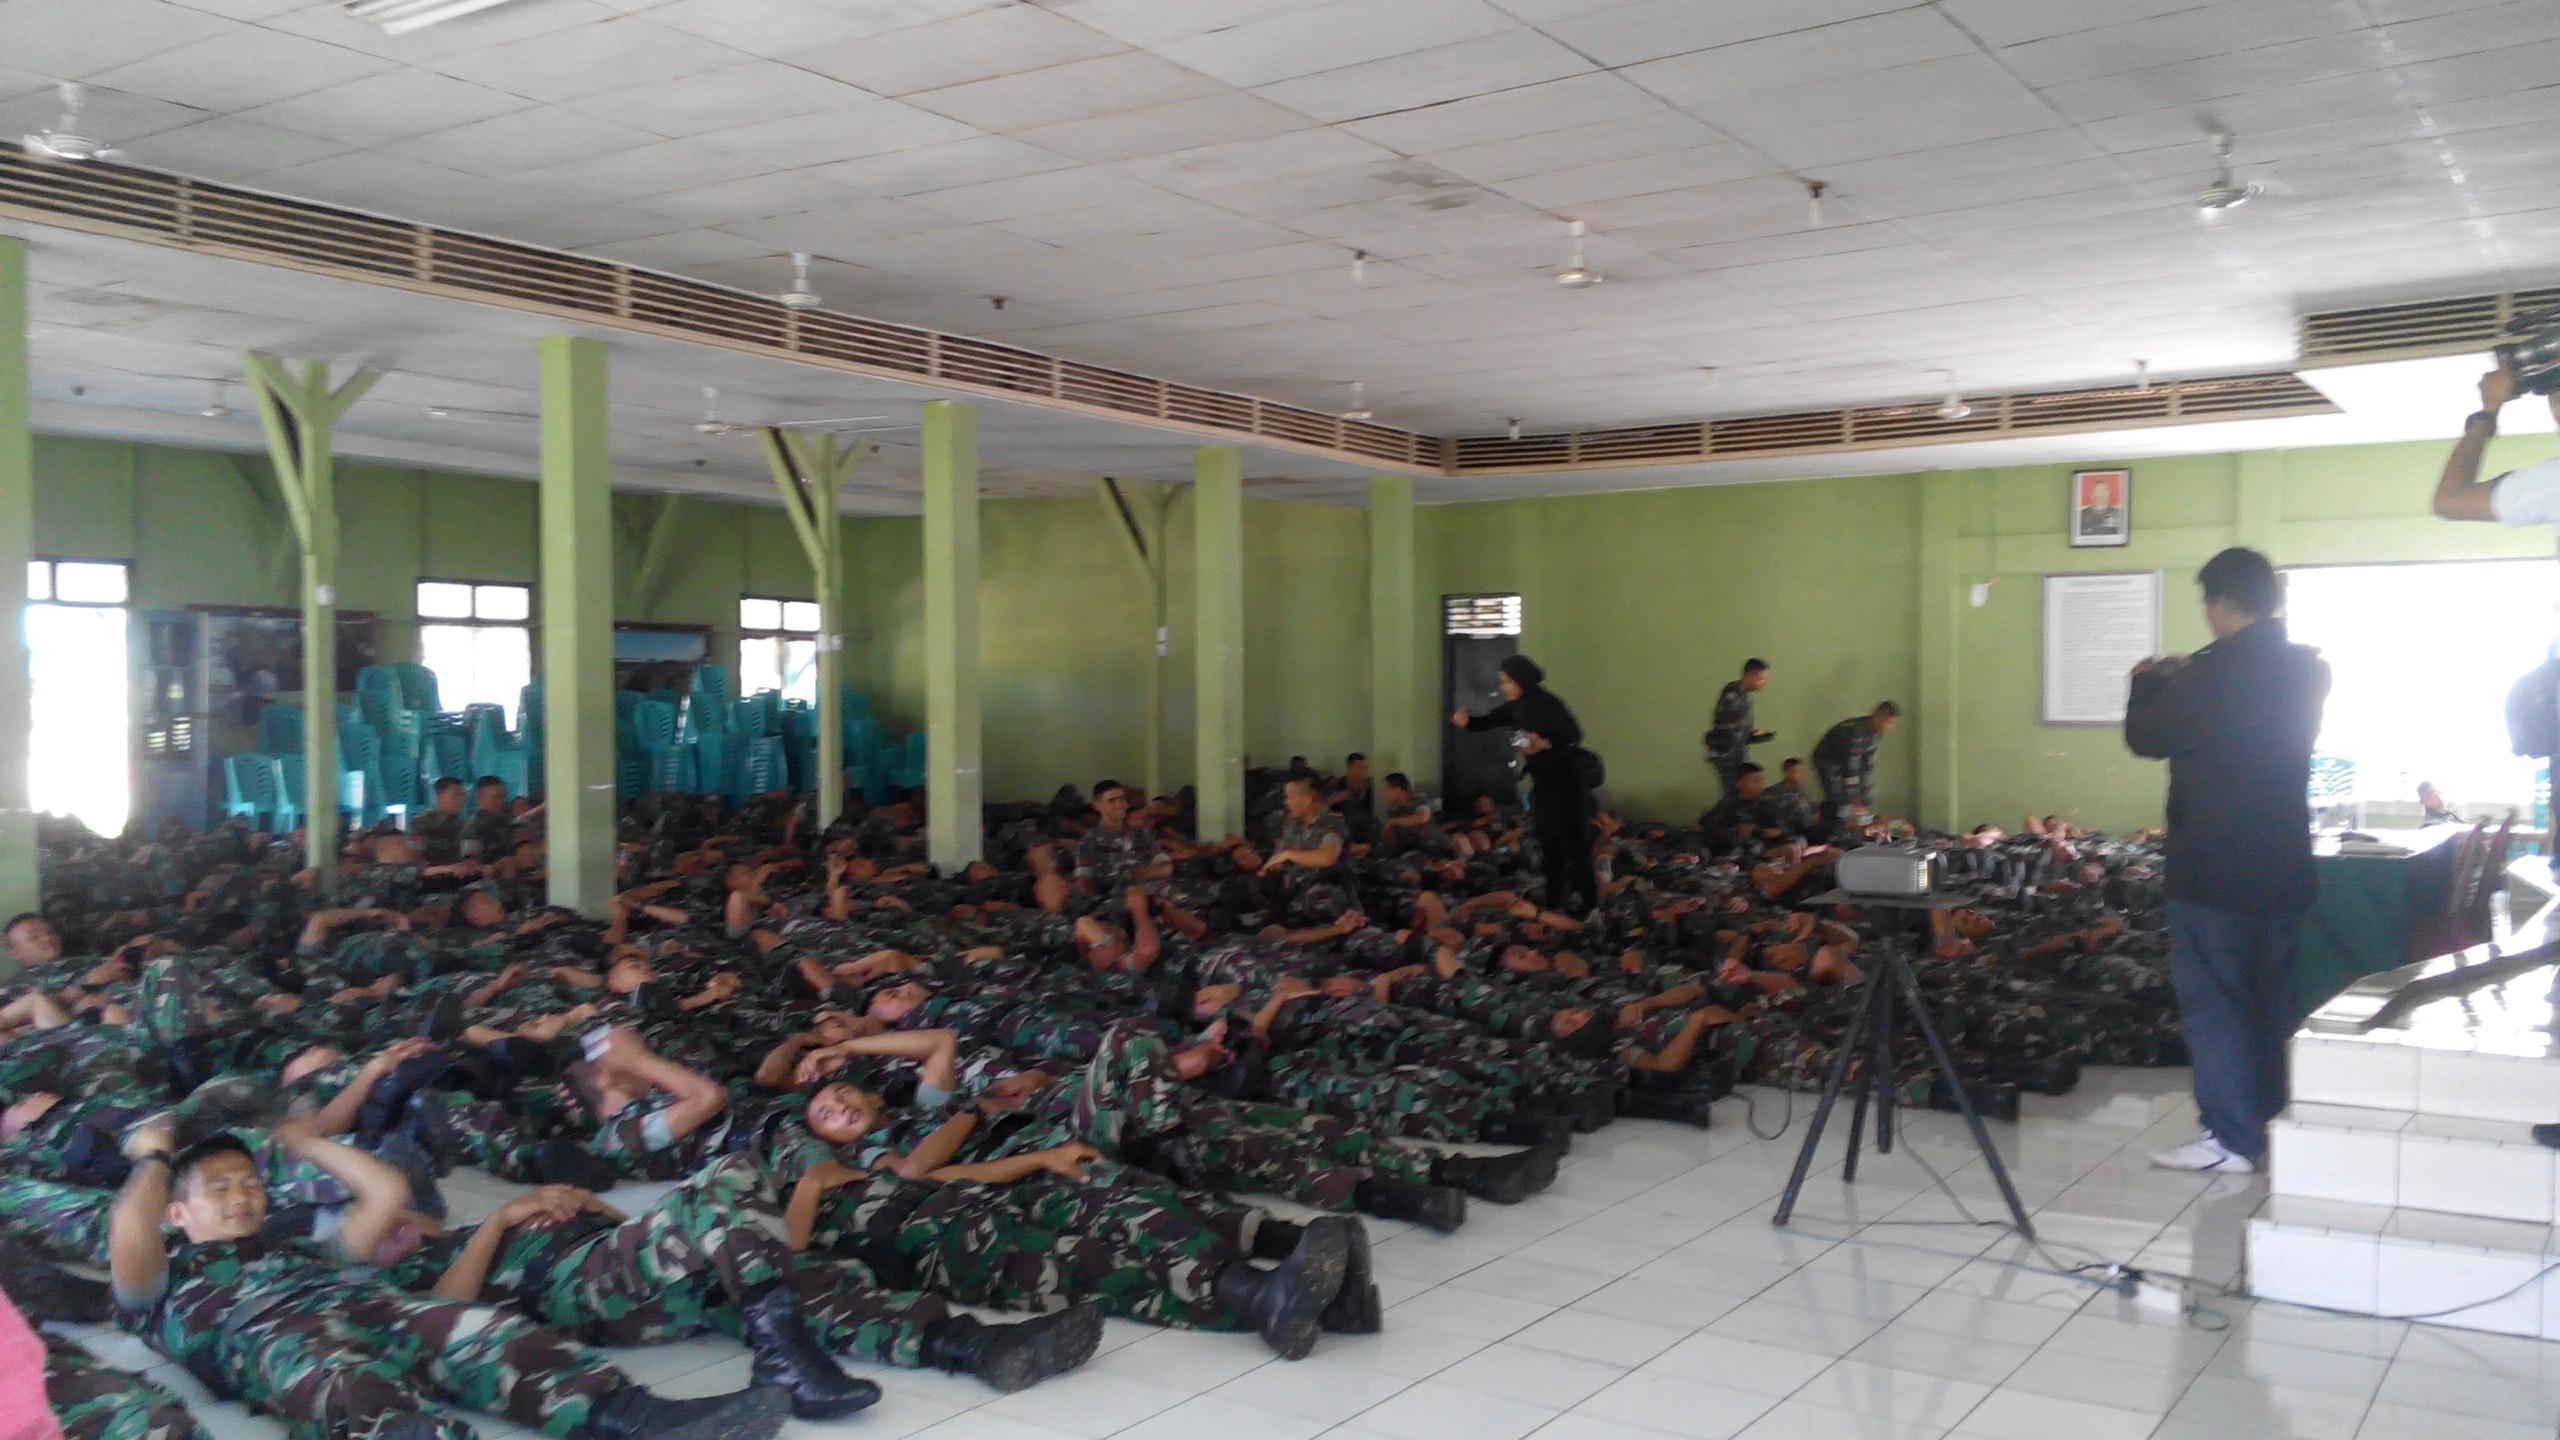 Penerapan Hipno Therapy pada Prajurit Batalyon 133 Yudha Sakti. Foto : Gesya Rikhaflina.